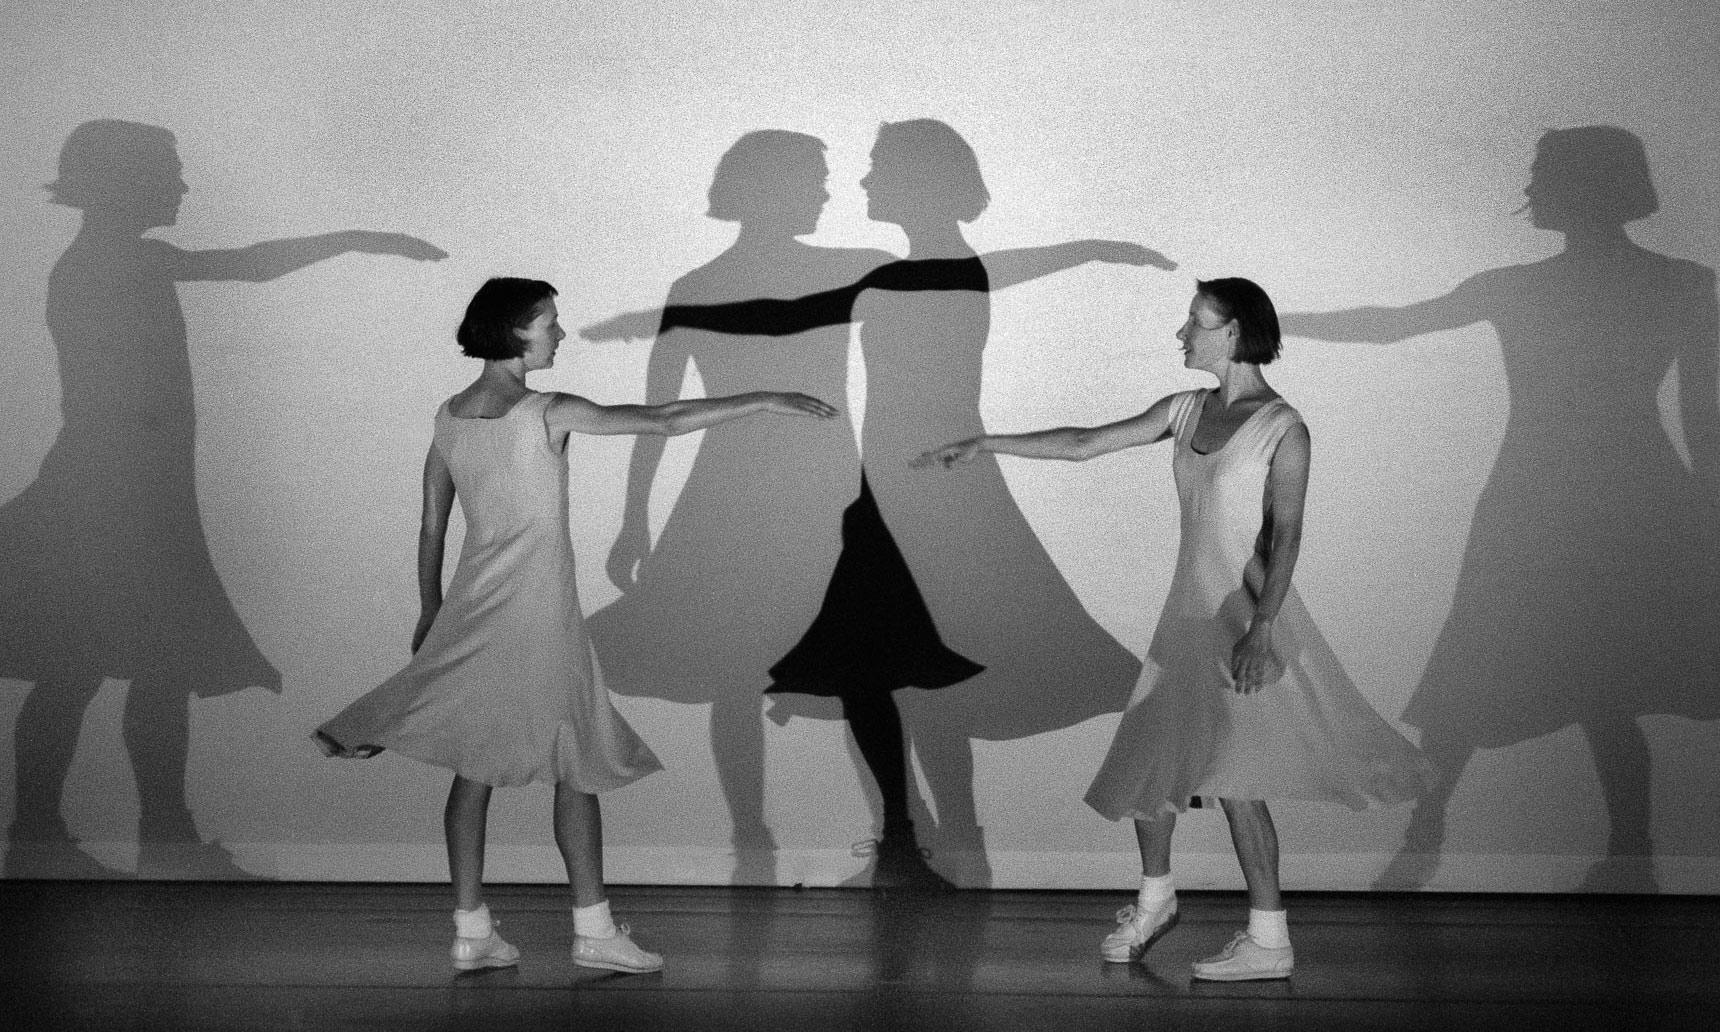 bureau-des-recommandations-dance-performance-fase-four-movements-to-the-music-of-steve-reich-anne-teresa-de-keersmaeker.jpg